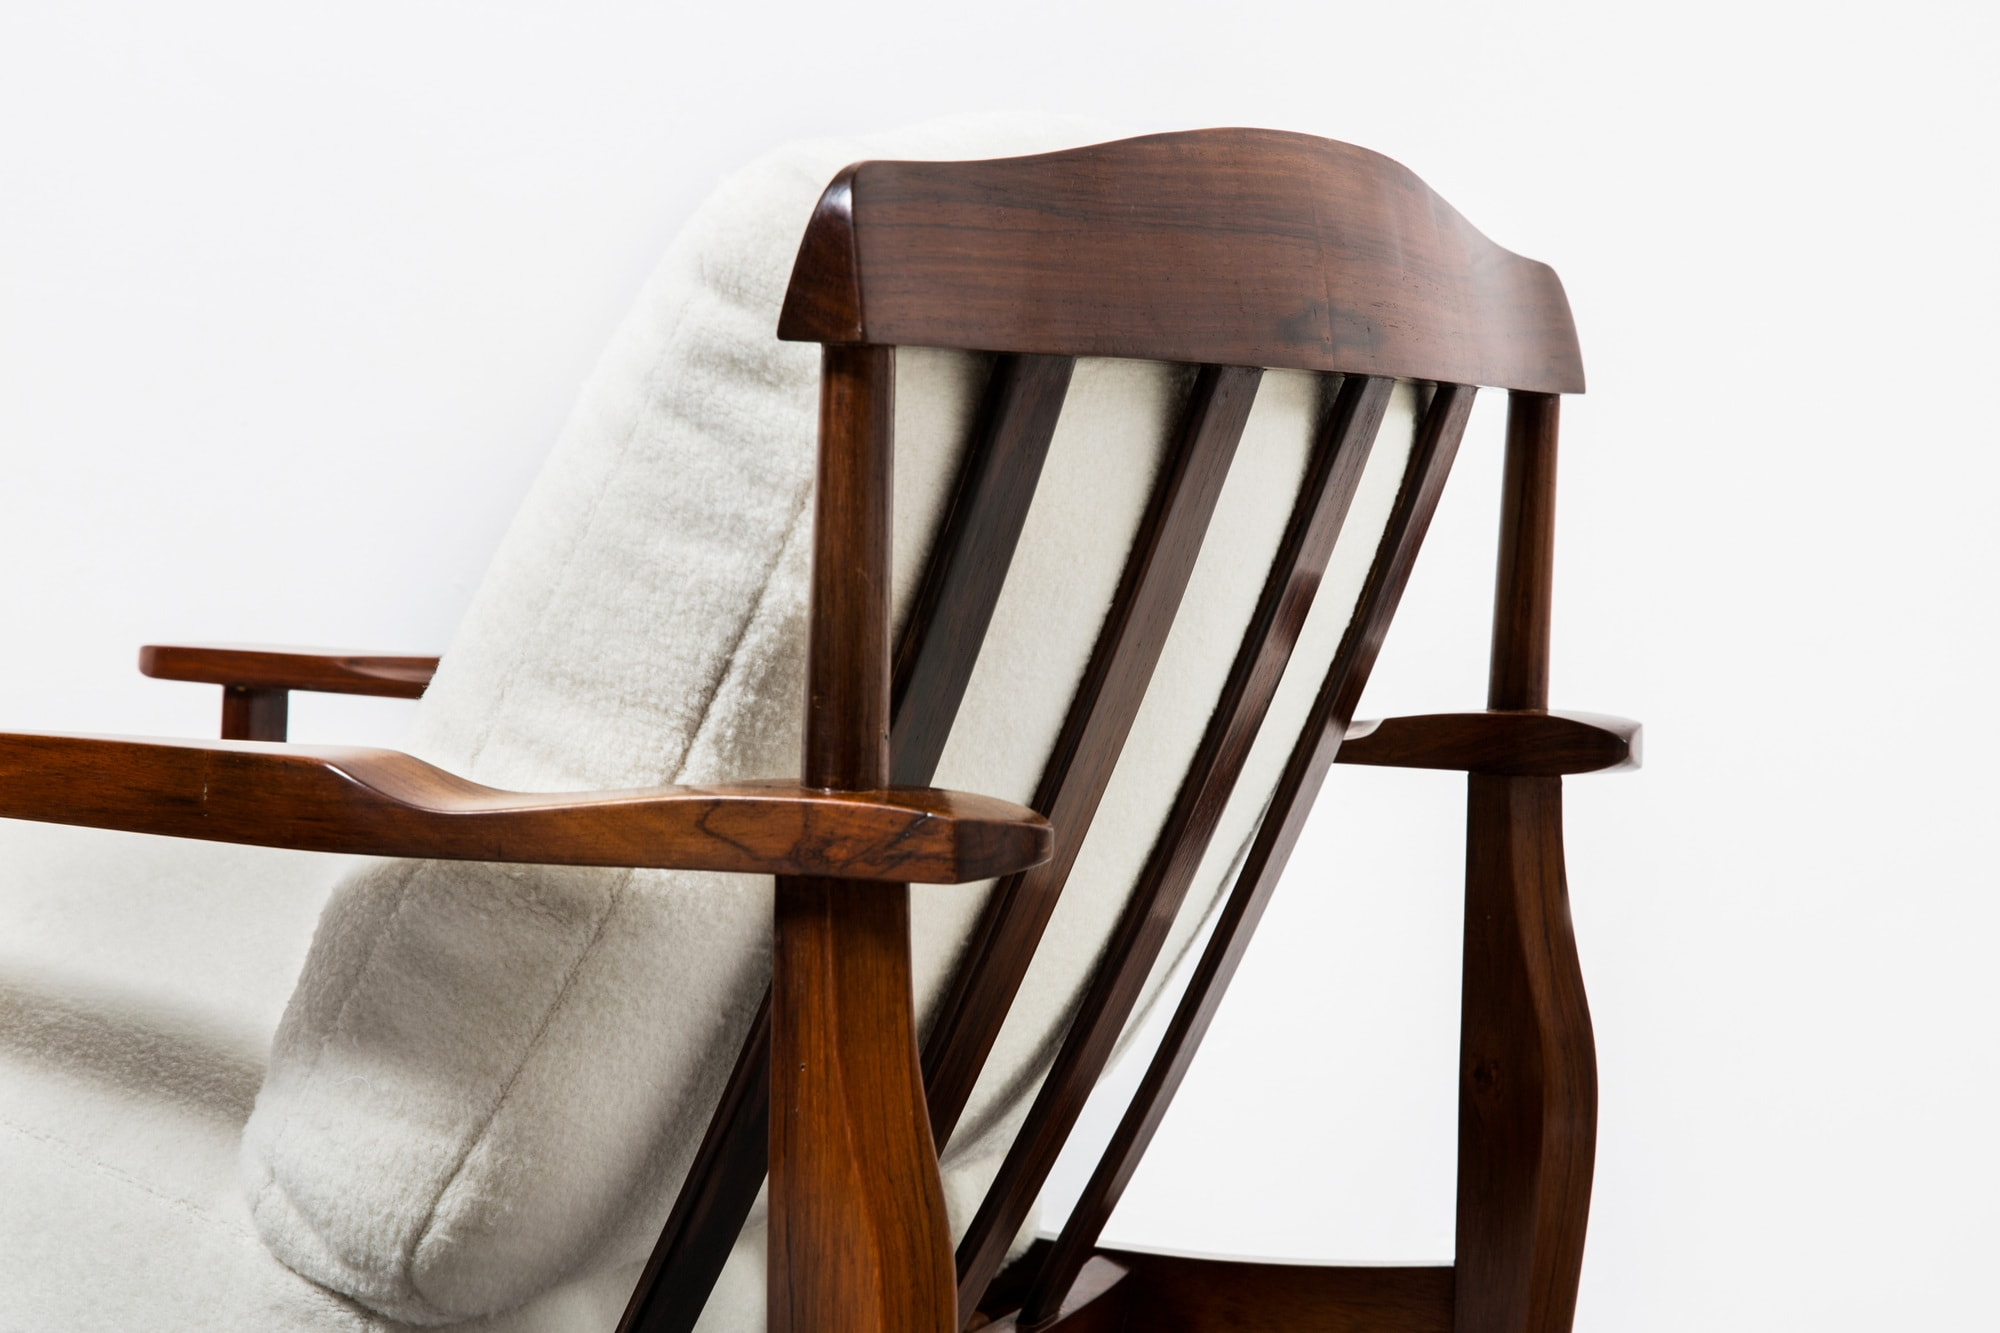 Joaquim Tenreiro, paire de fauteuils, vue 02